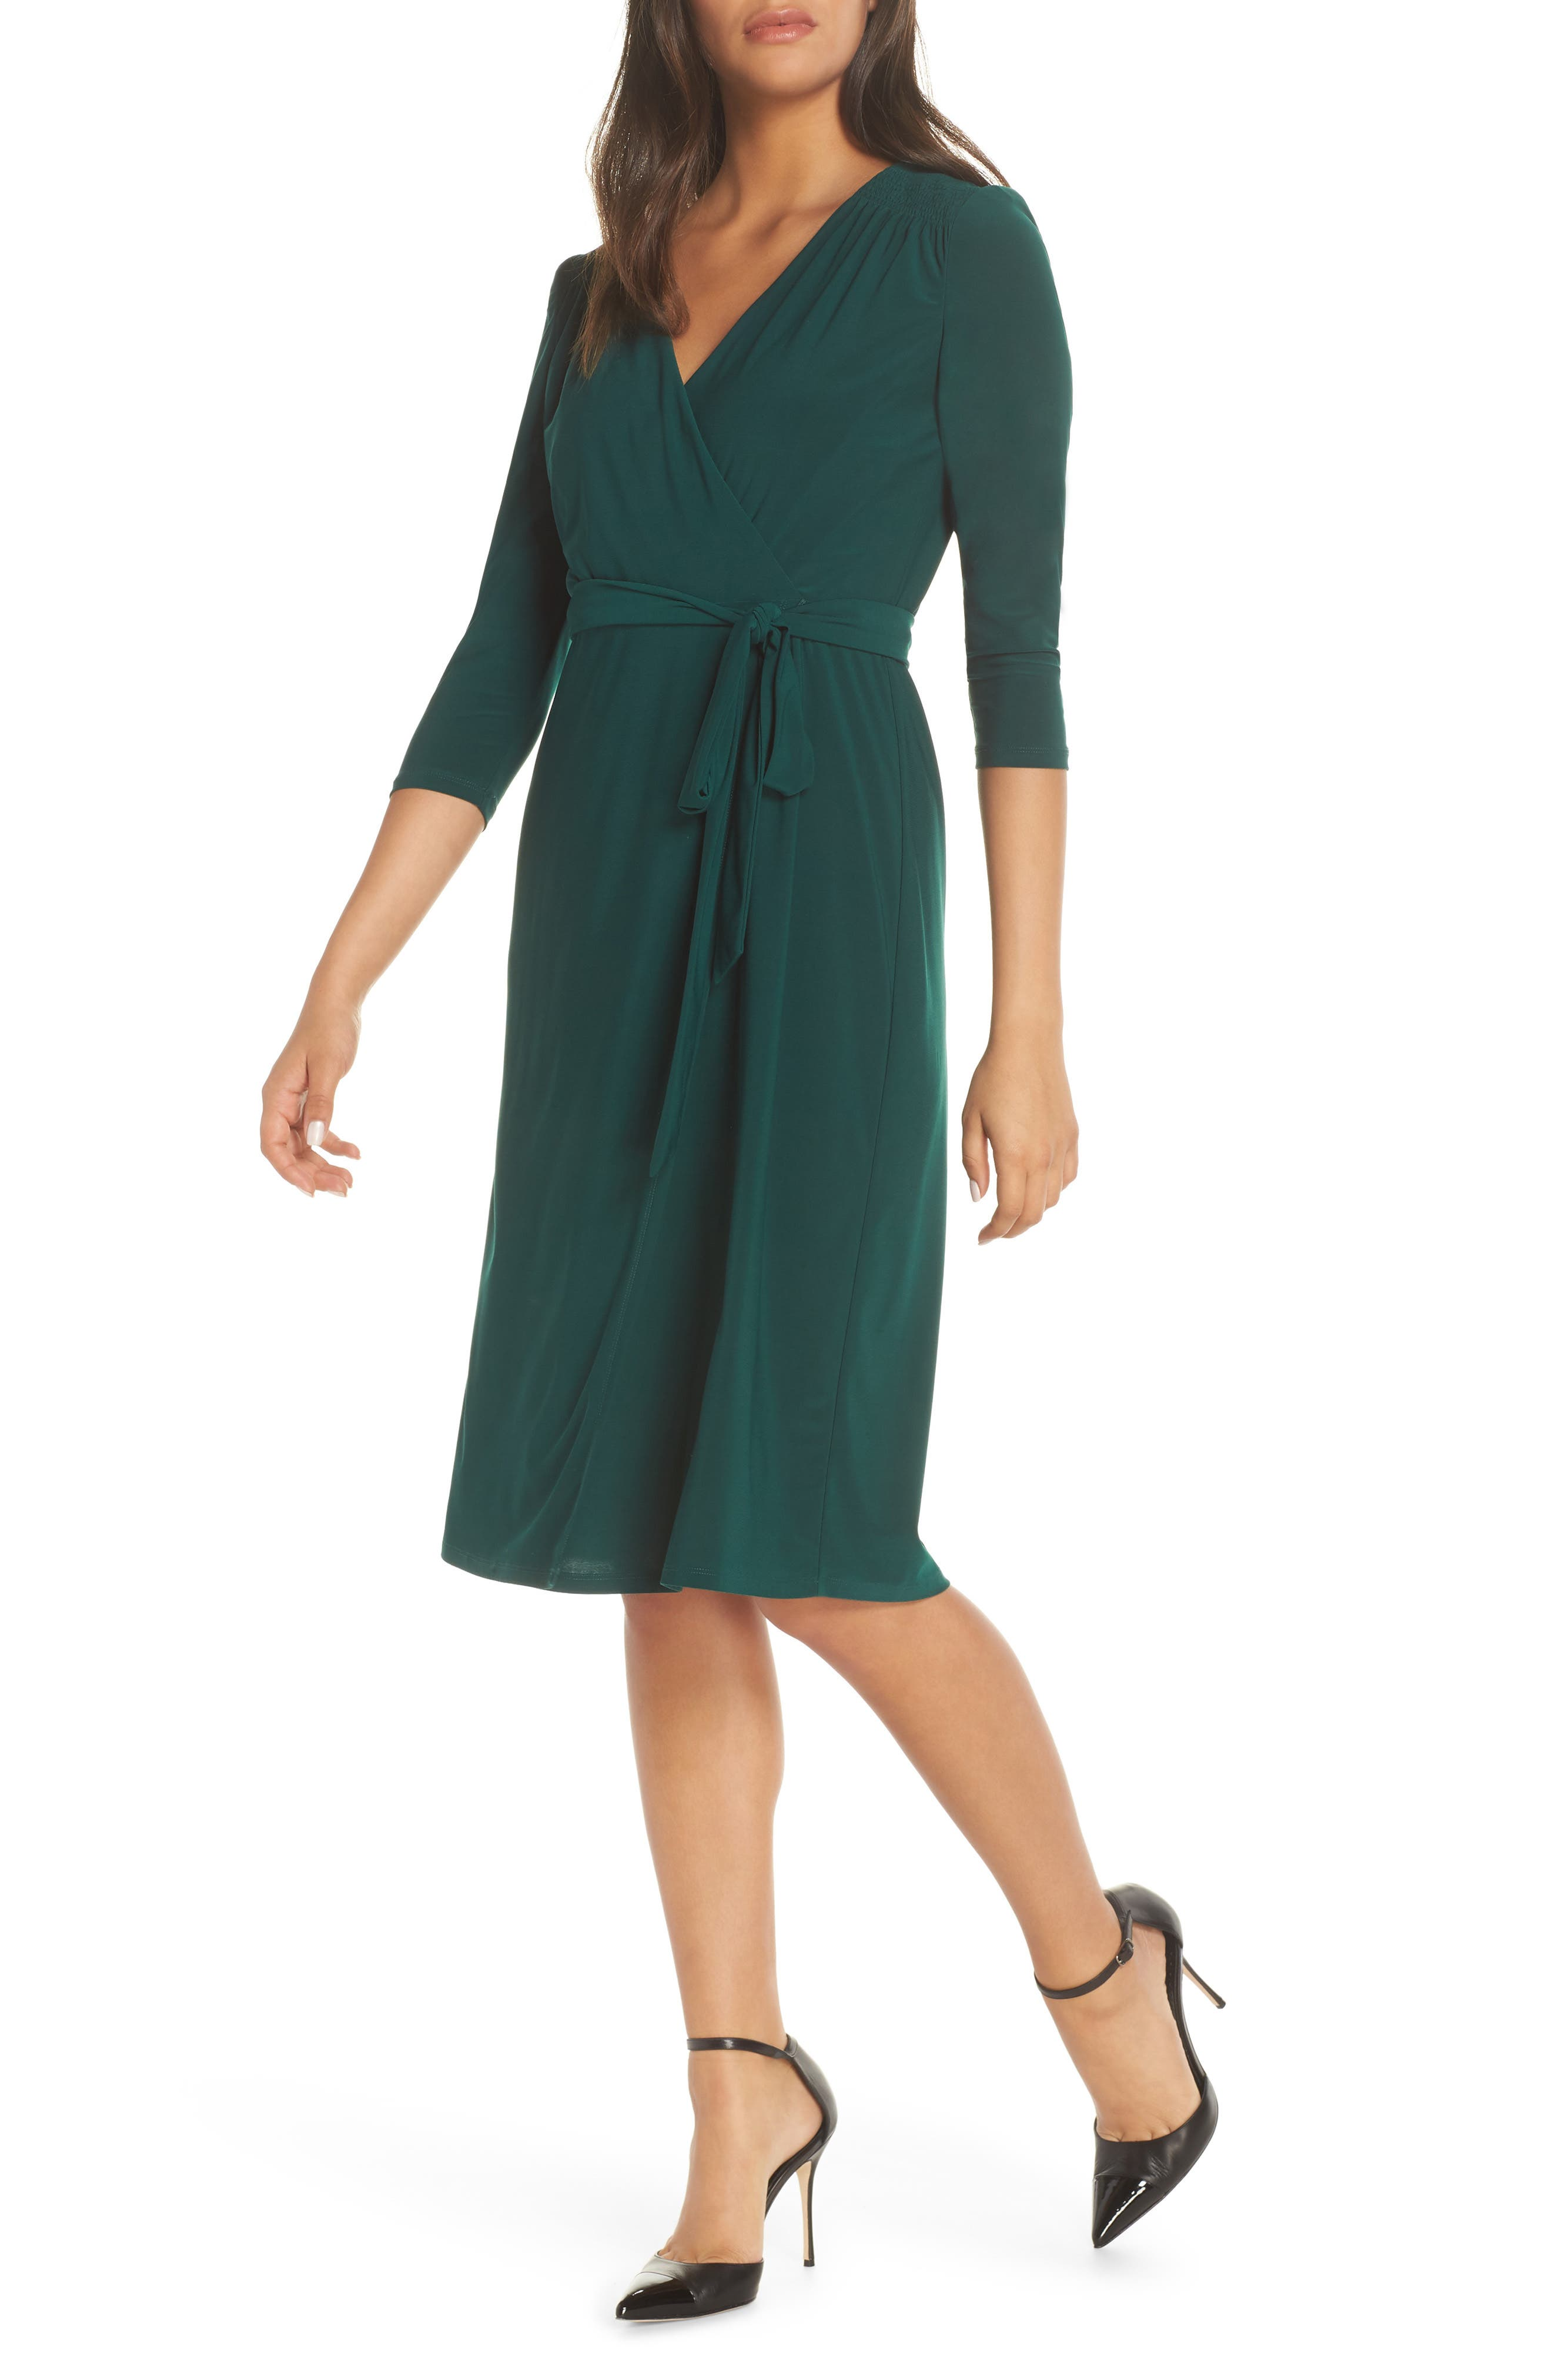 ELIZA J, Smocked Shoulder Wrap Dress, Main thumbnail 1, color, 376